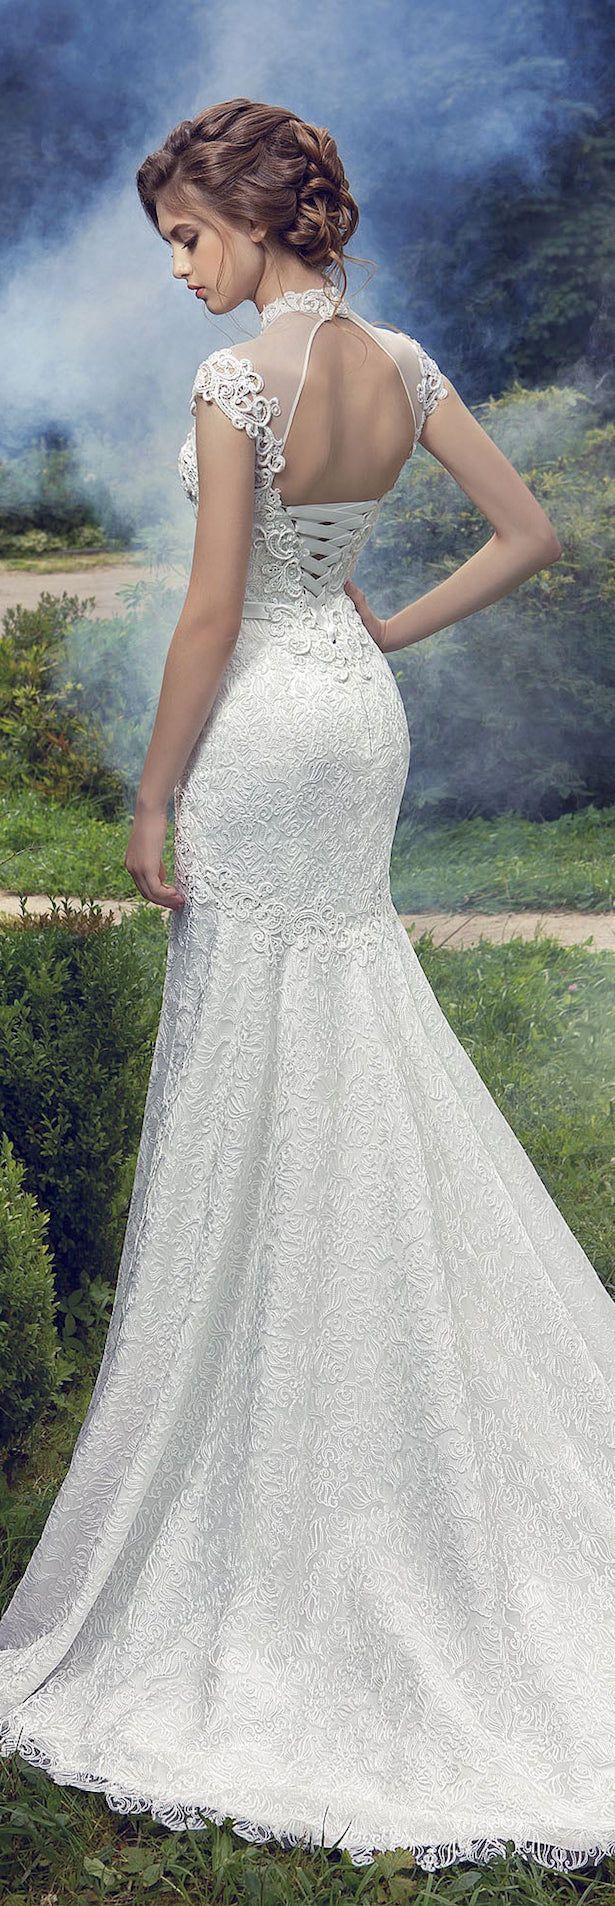 671 best wedding dresses images on pinterest wedding dressses